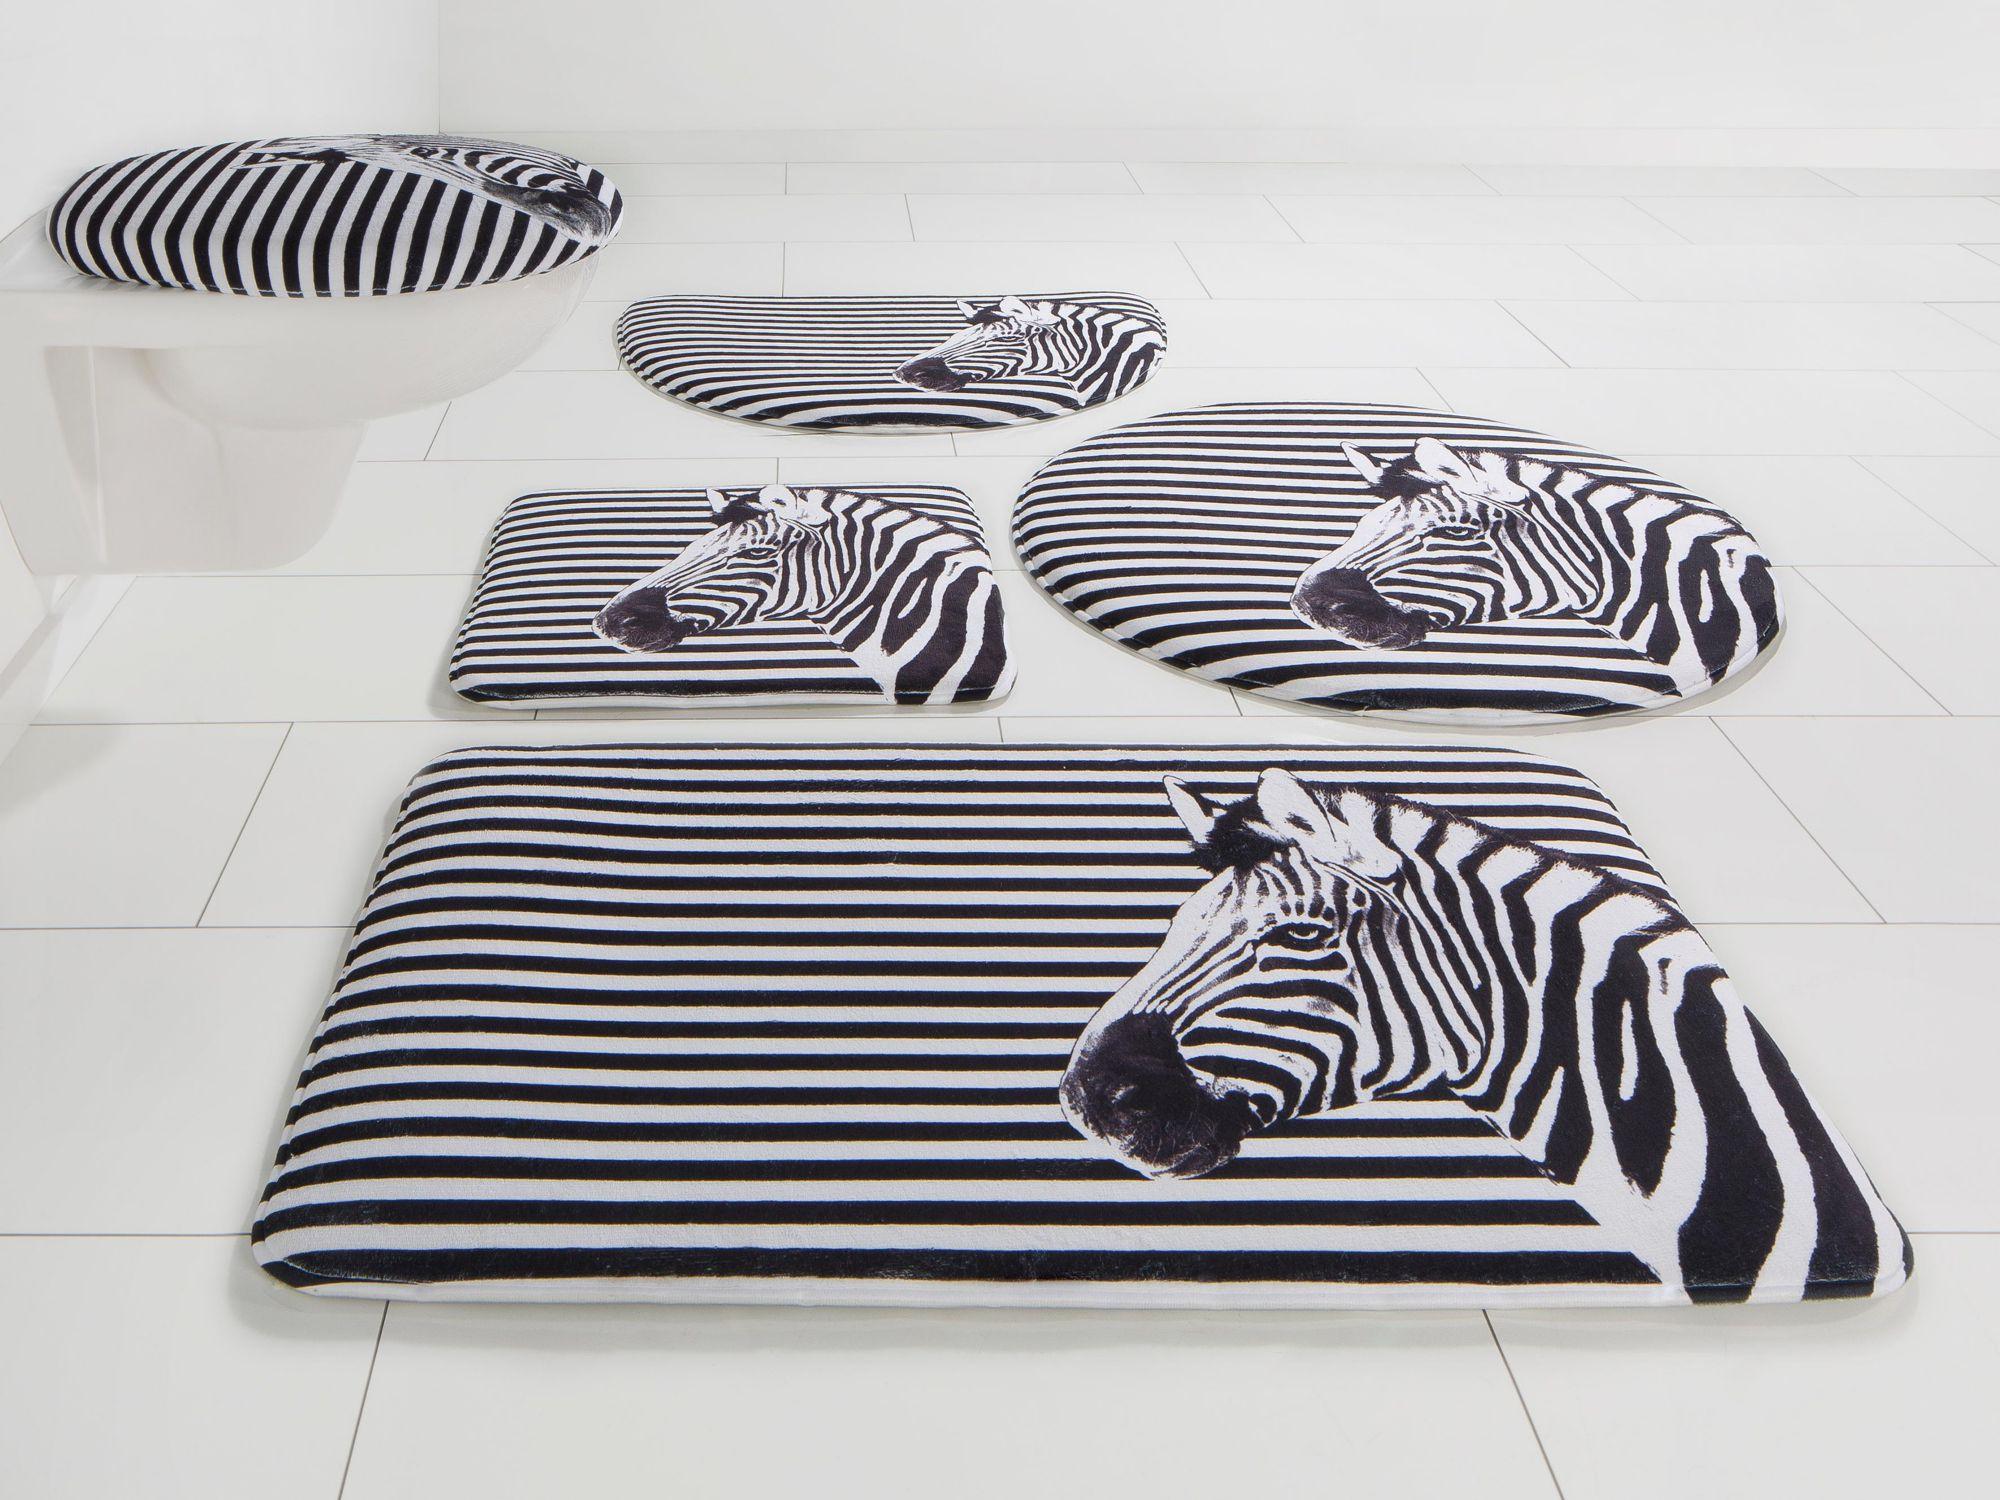 BRUNO BANANI Badematte, 3 tlg. Stand WC-Set, Bruno Banani, »Zebra«, Höhe 14 mm